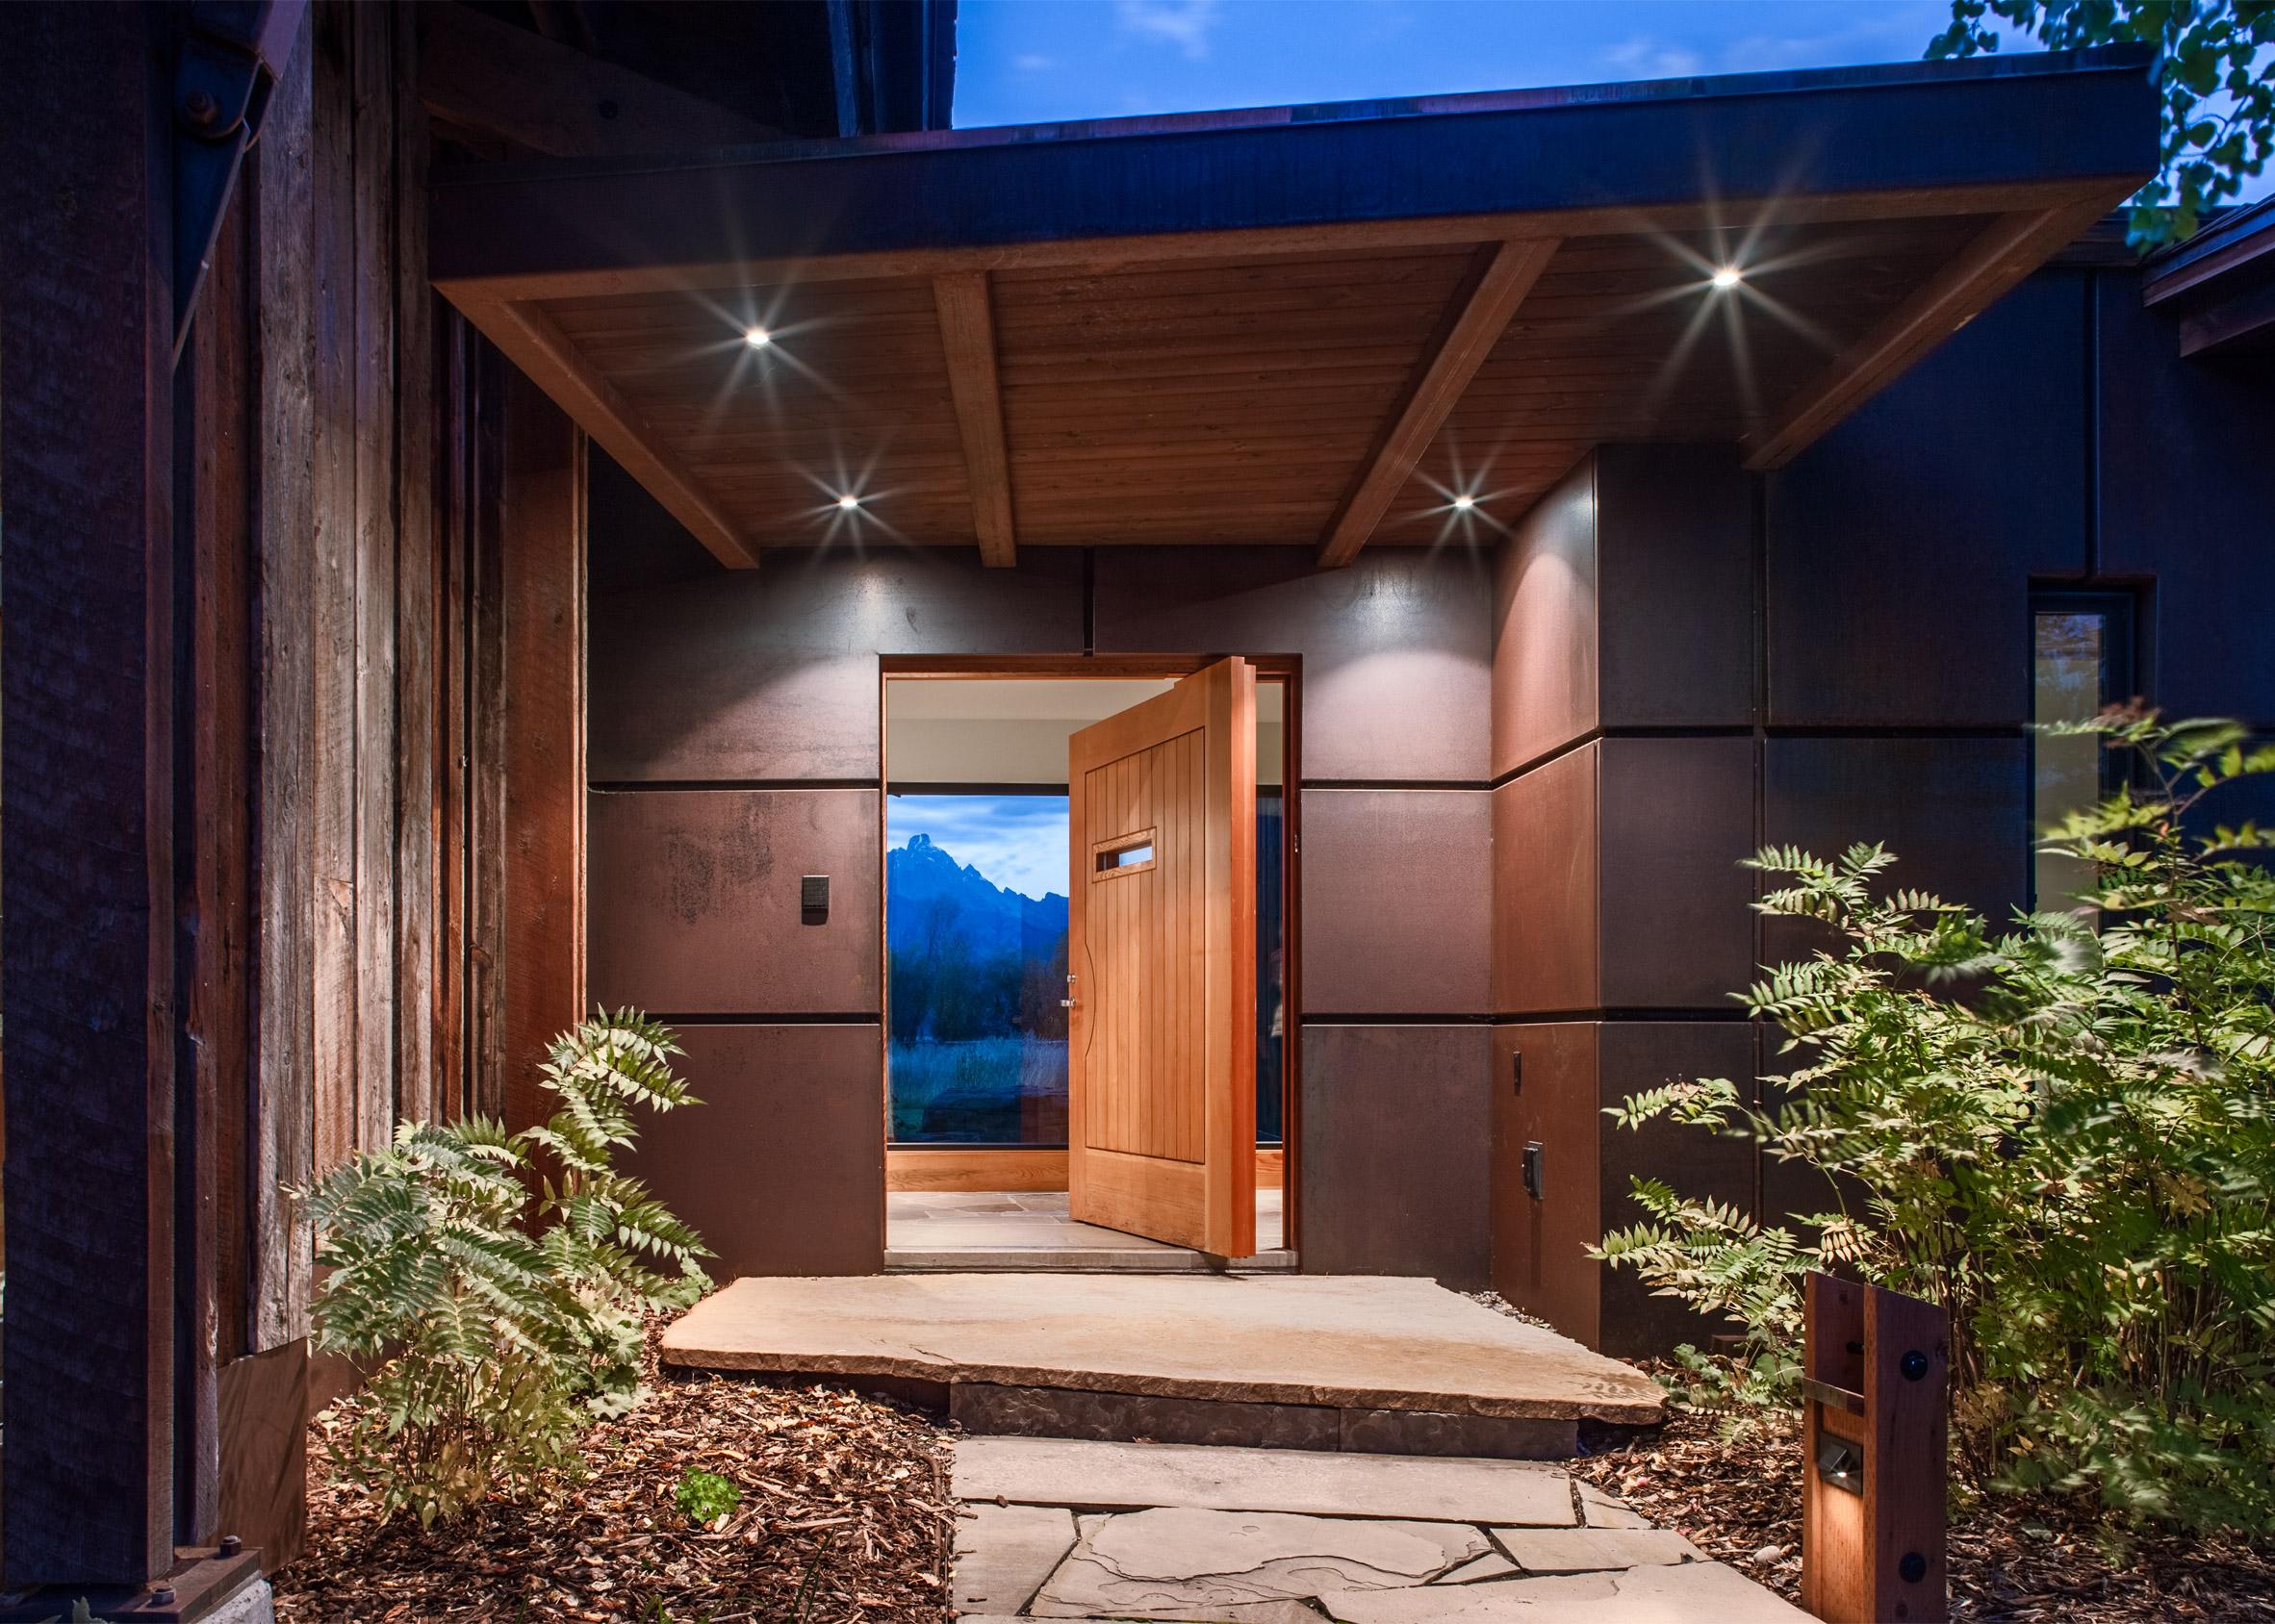 Safir Residence by WardBlake